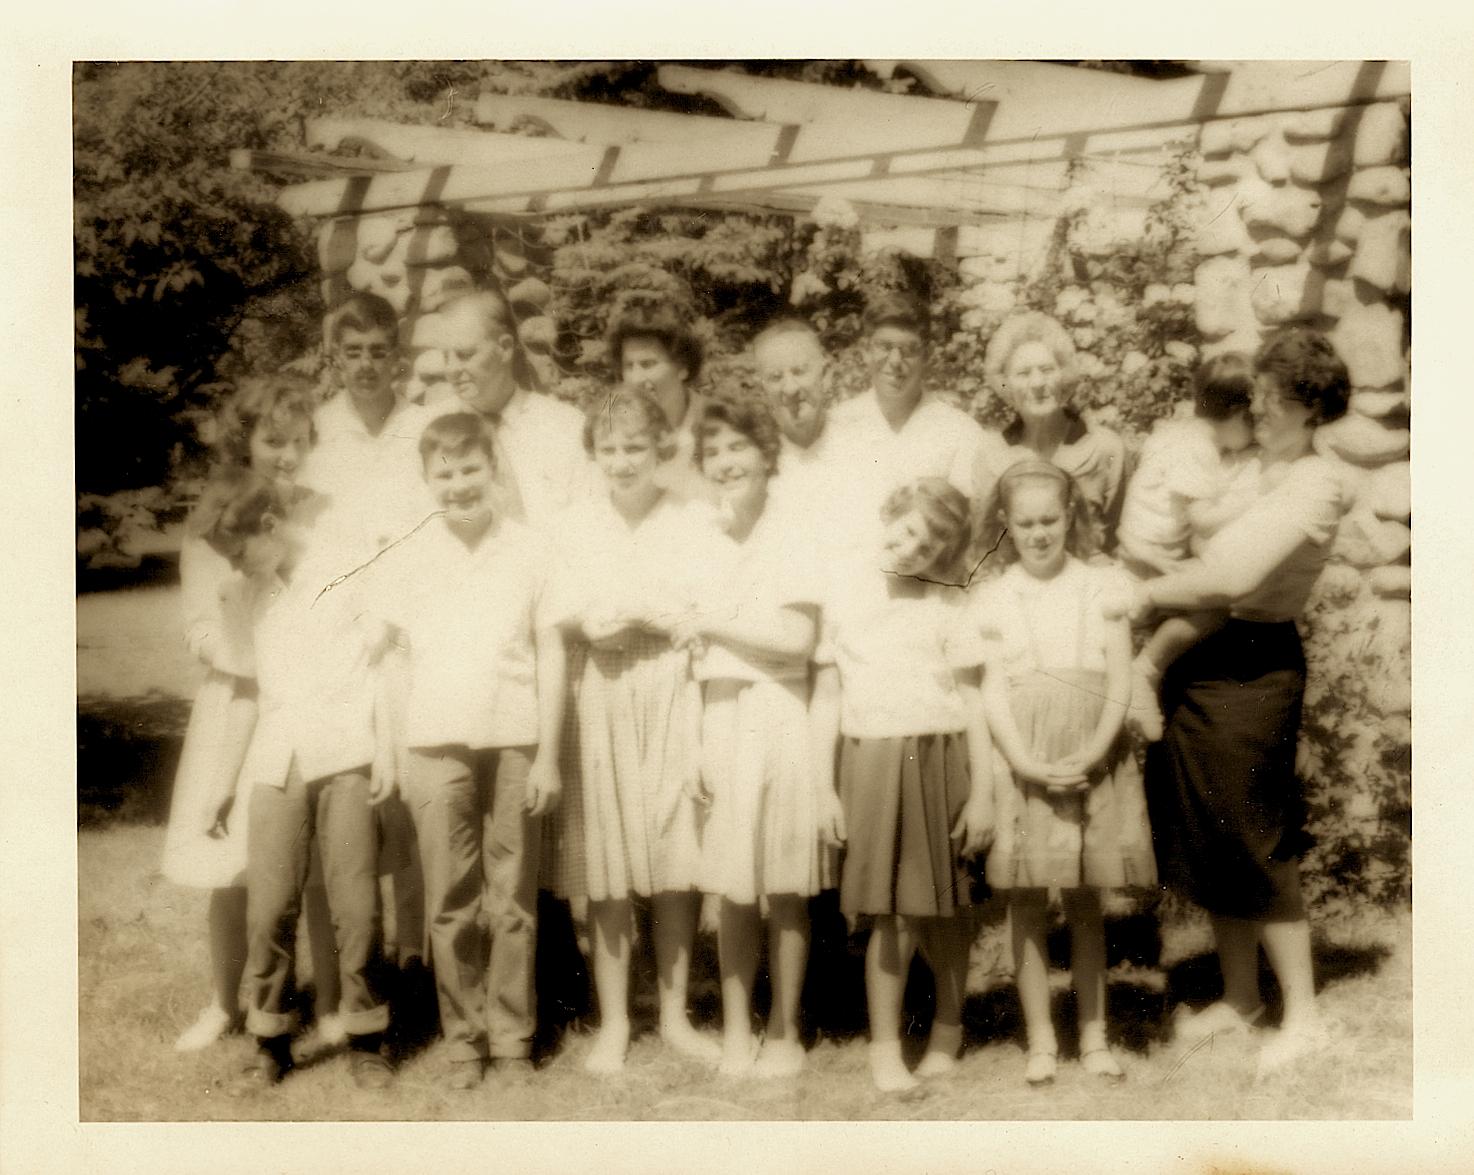 Hacken & Ogilvie Reunion, 1959